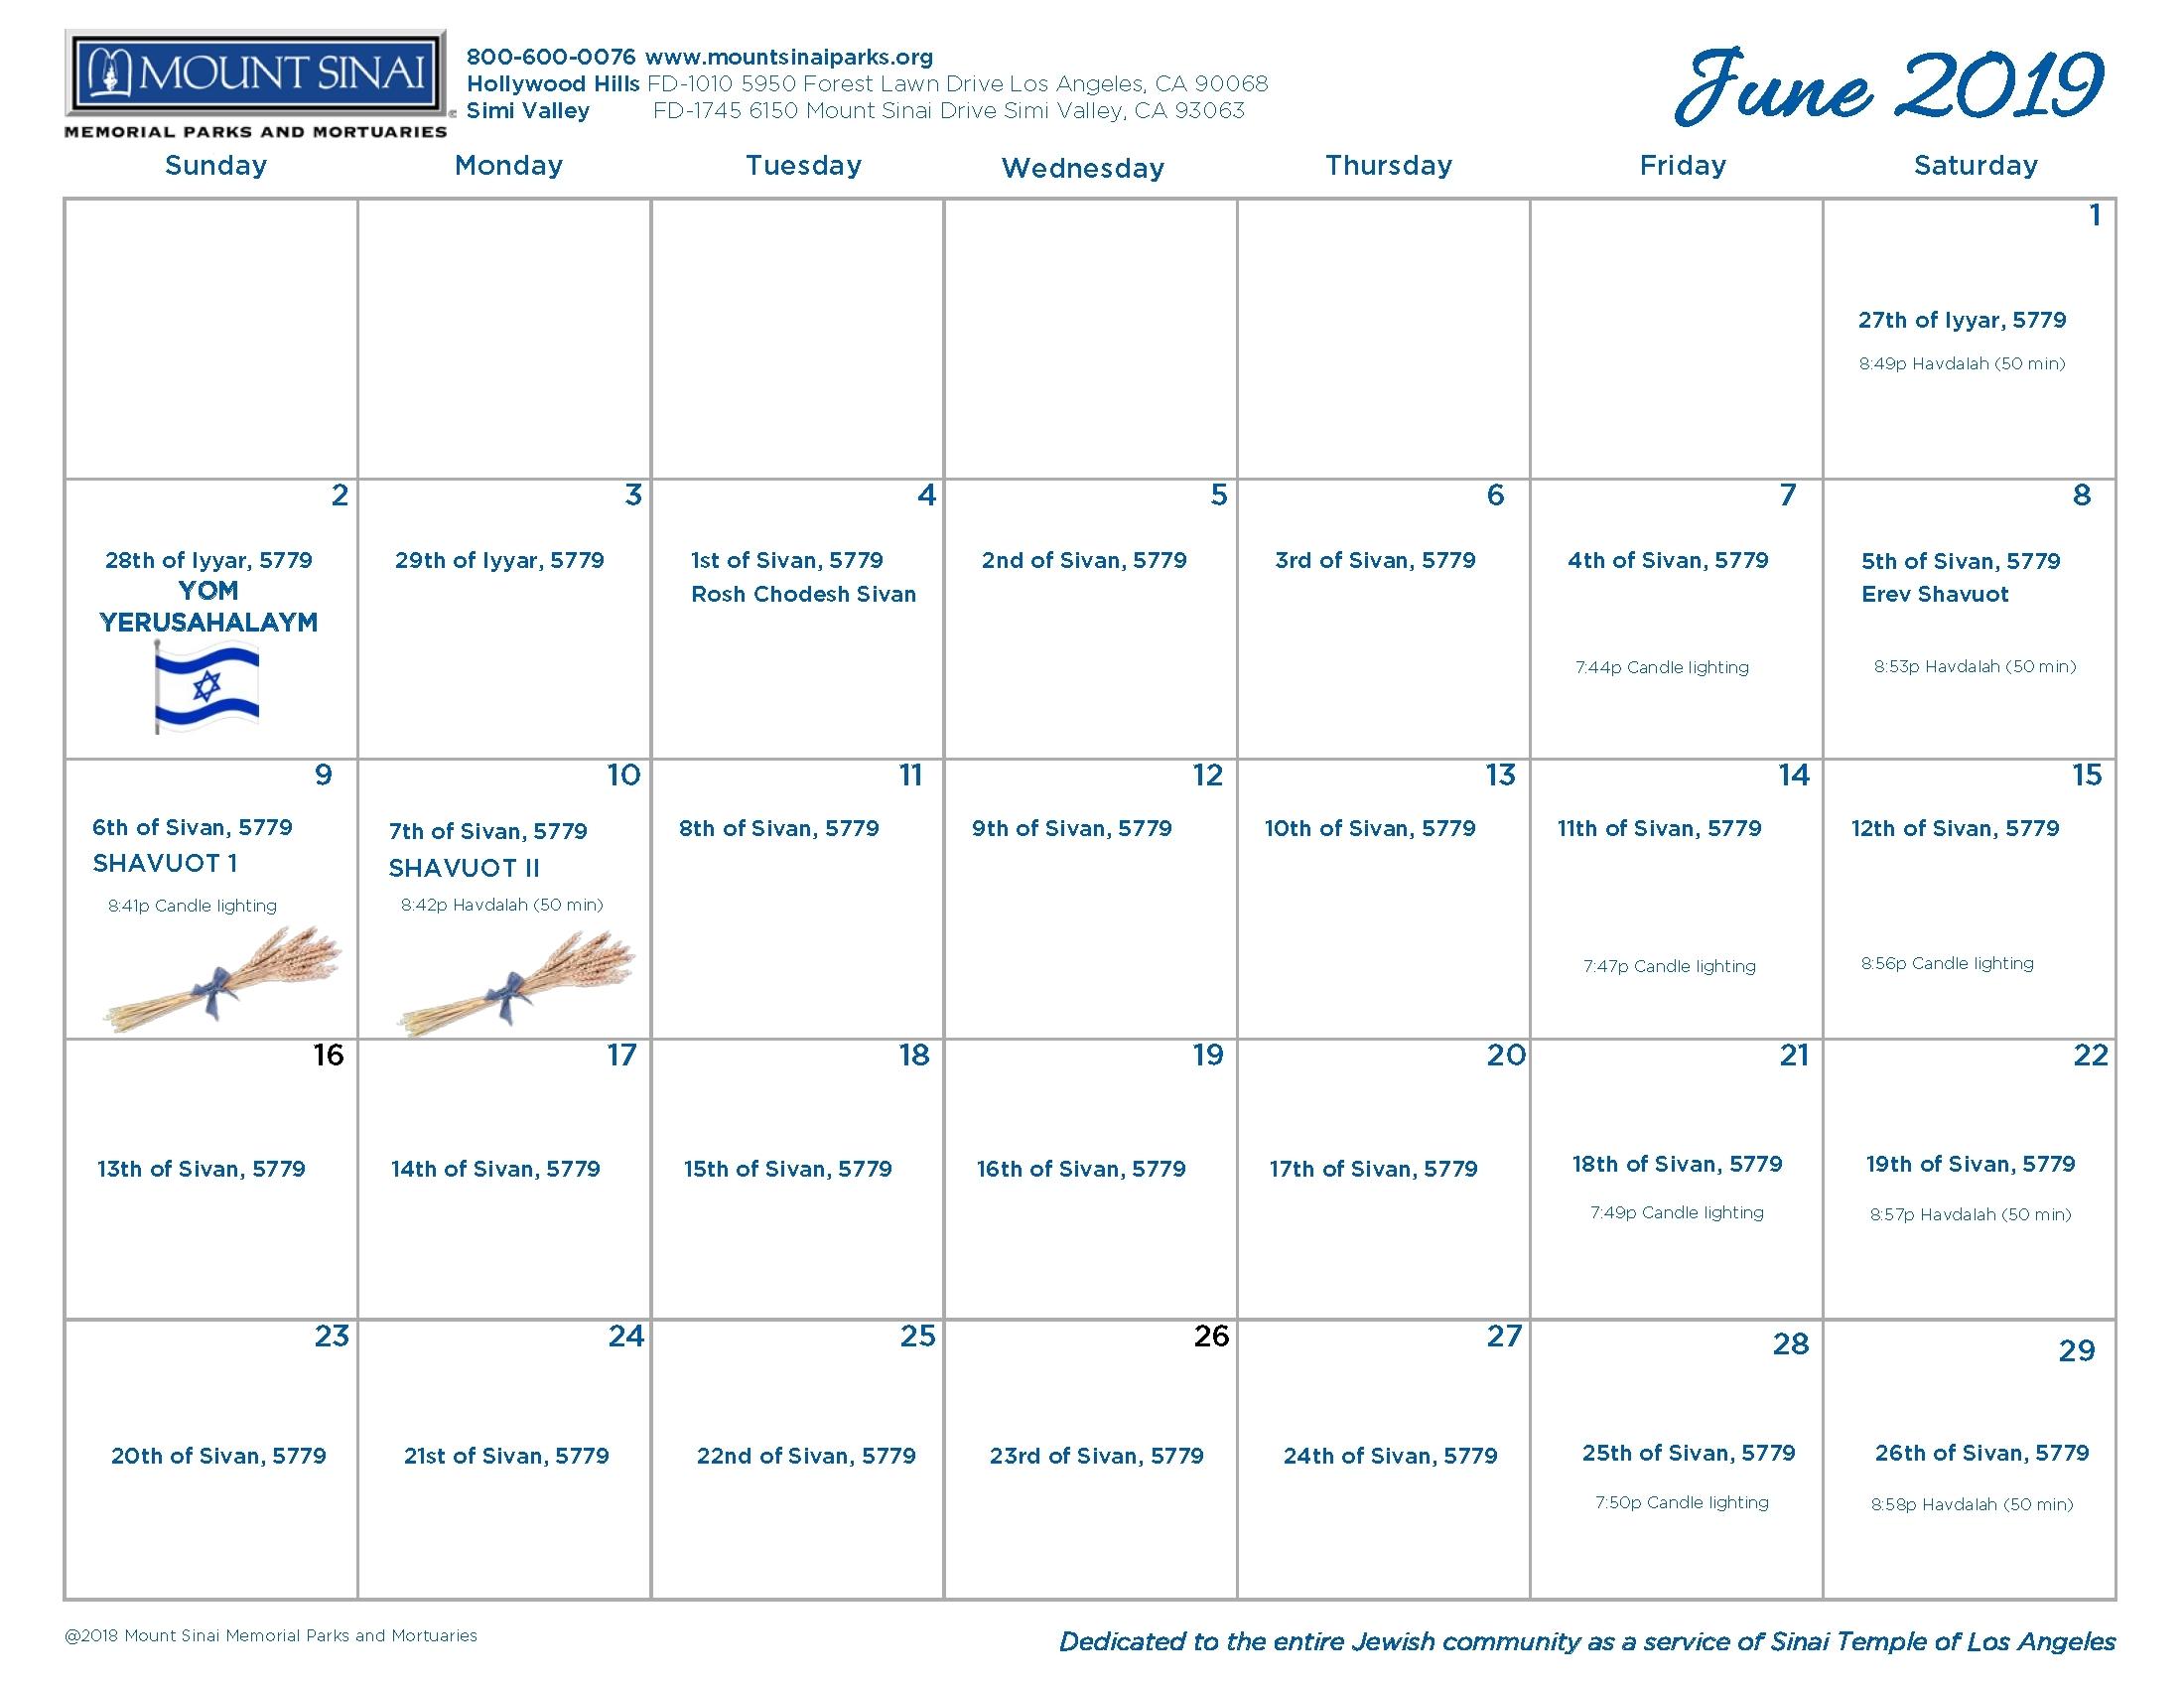 Calendar Jewish Holidays October 2019 • Printable Blank-Dates For The Jewish Holidays In October